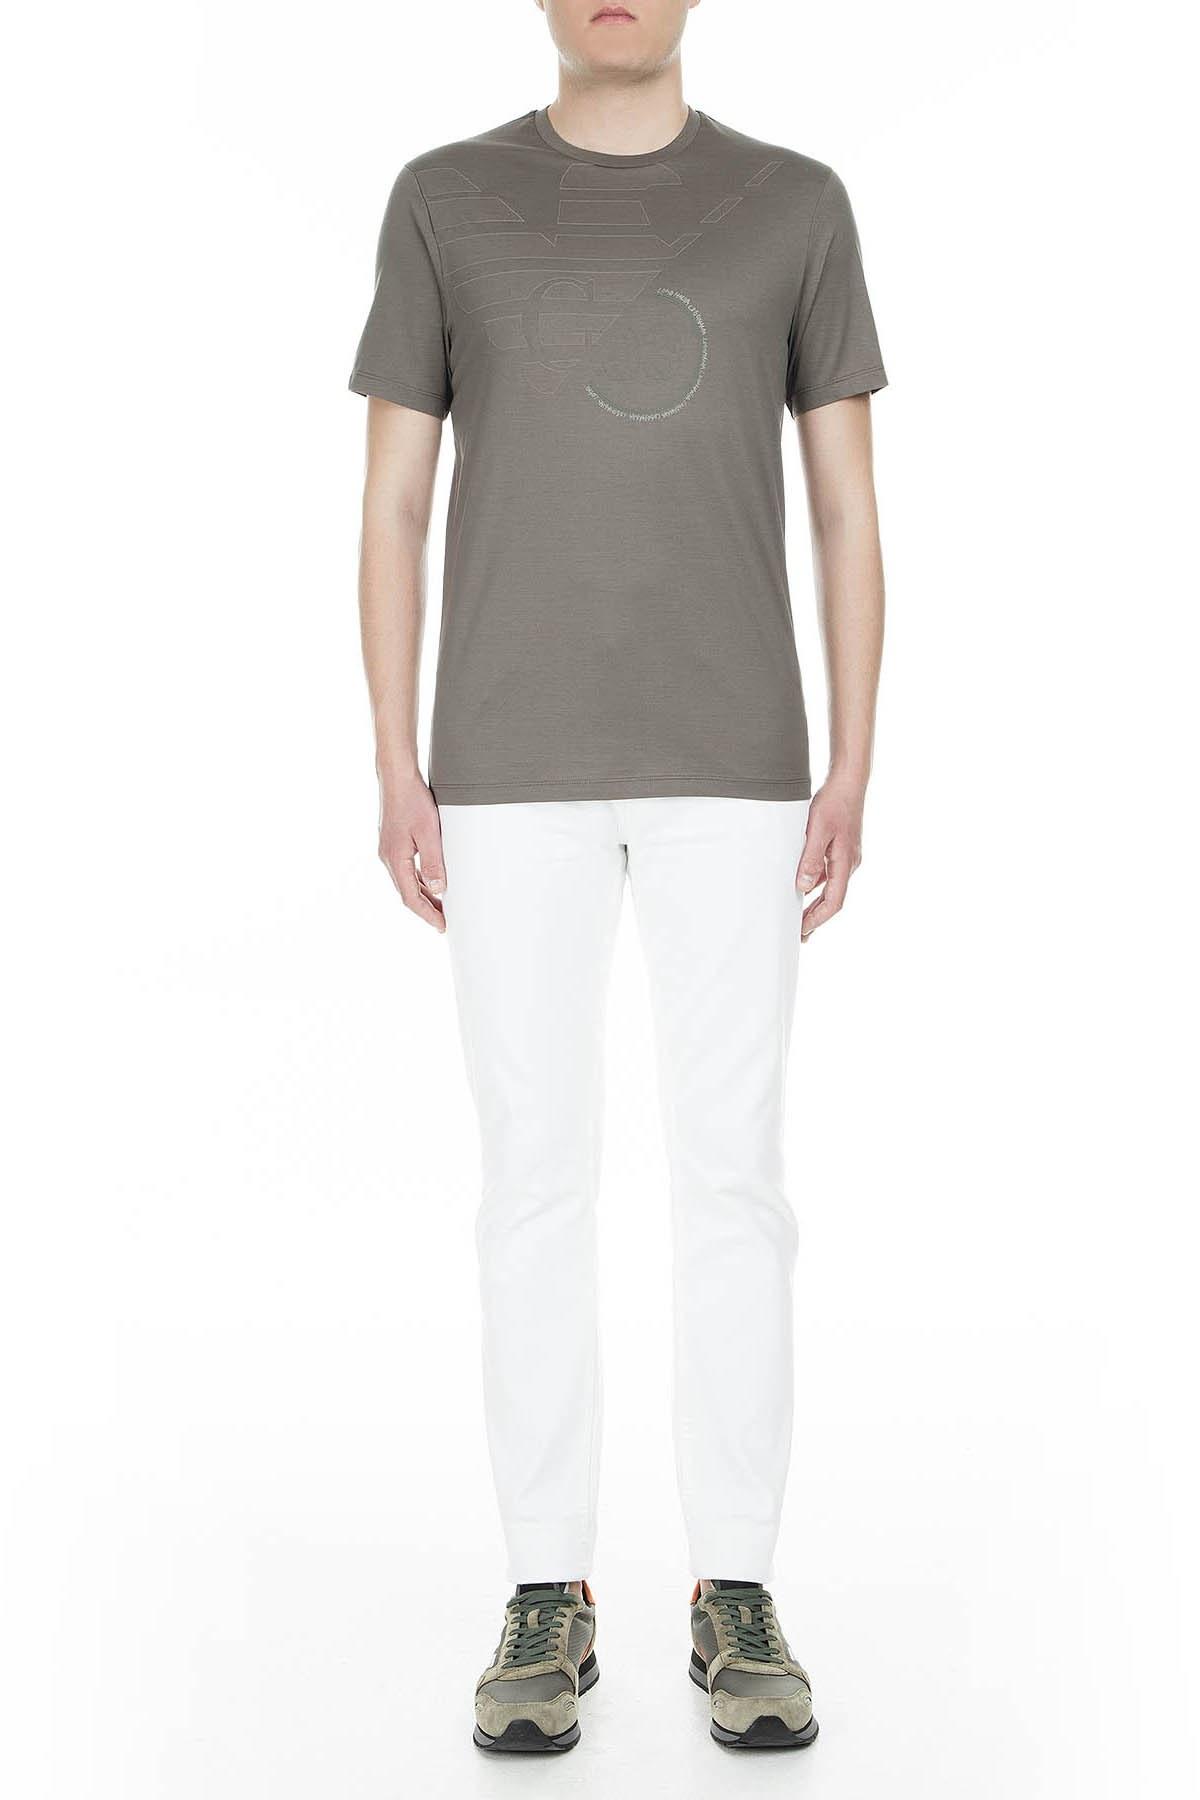 Emporio Armani Erkek T Shirt 3G1TL1 1JTUZ F645 GRİ